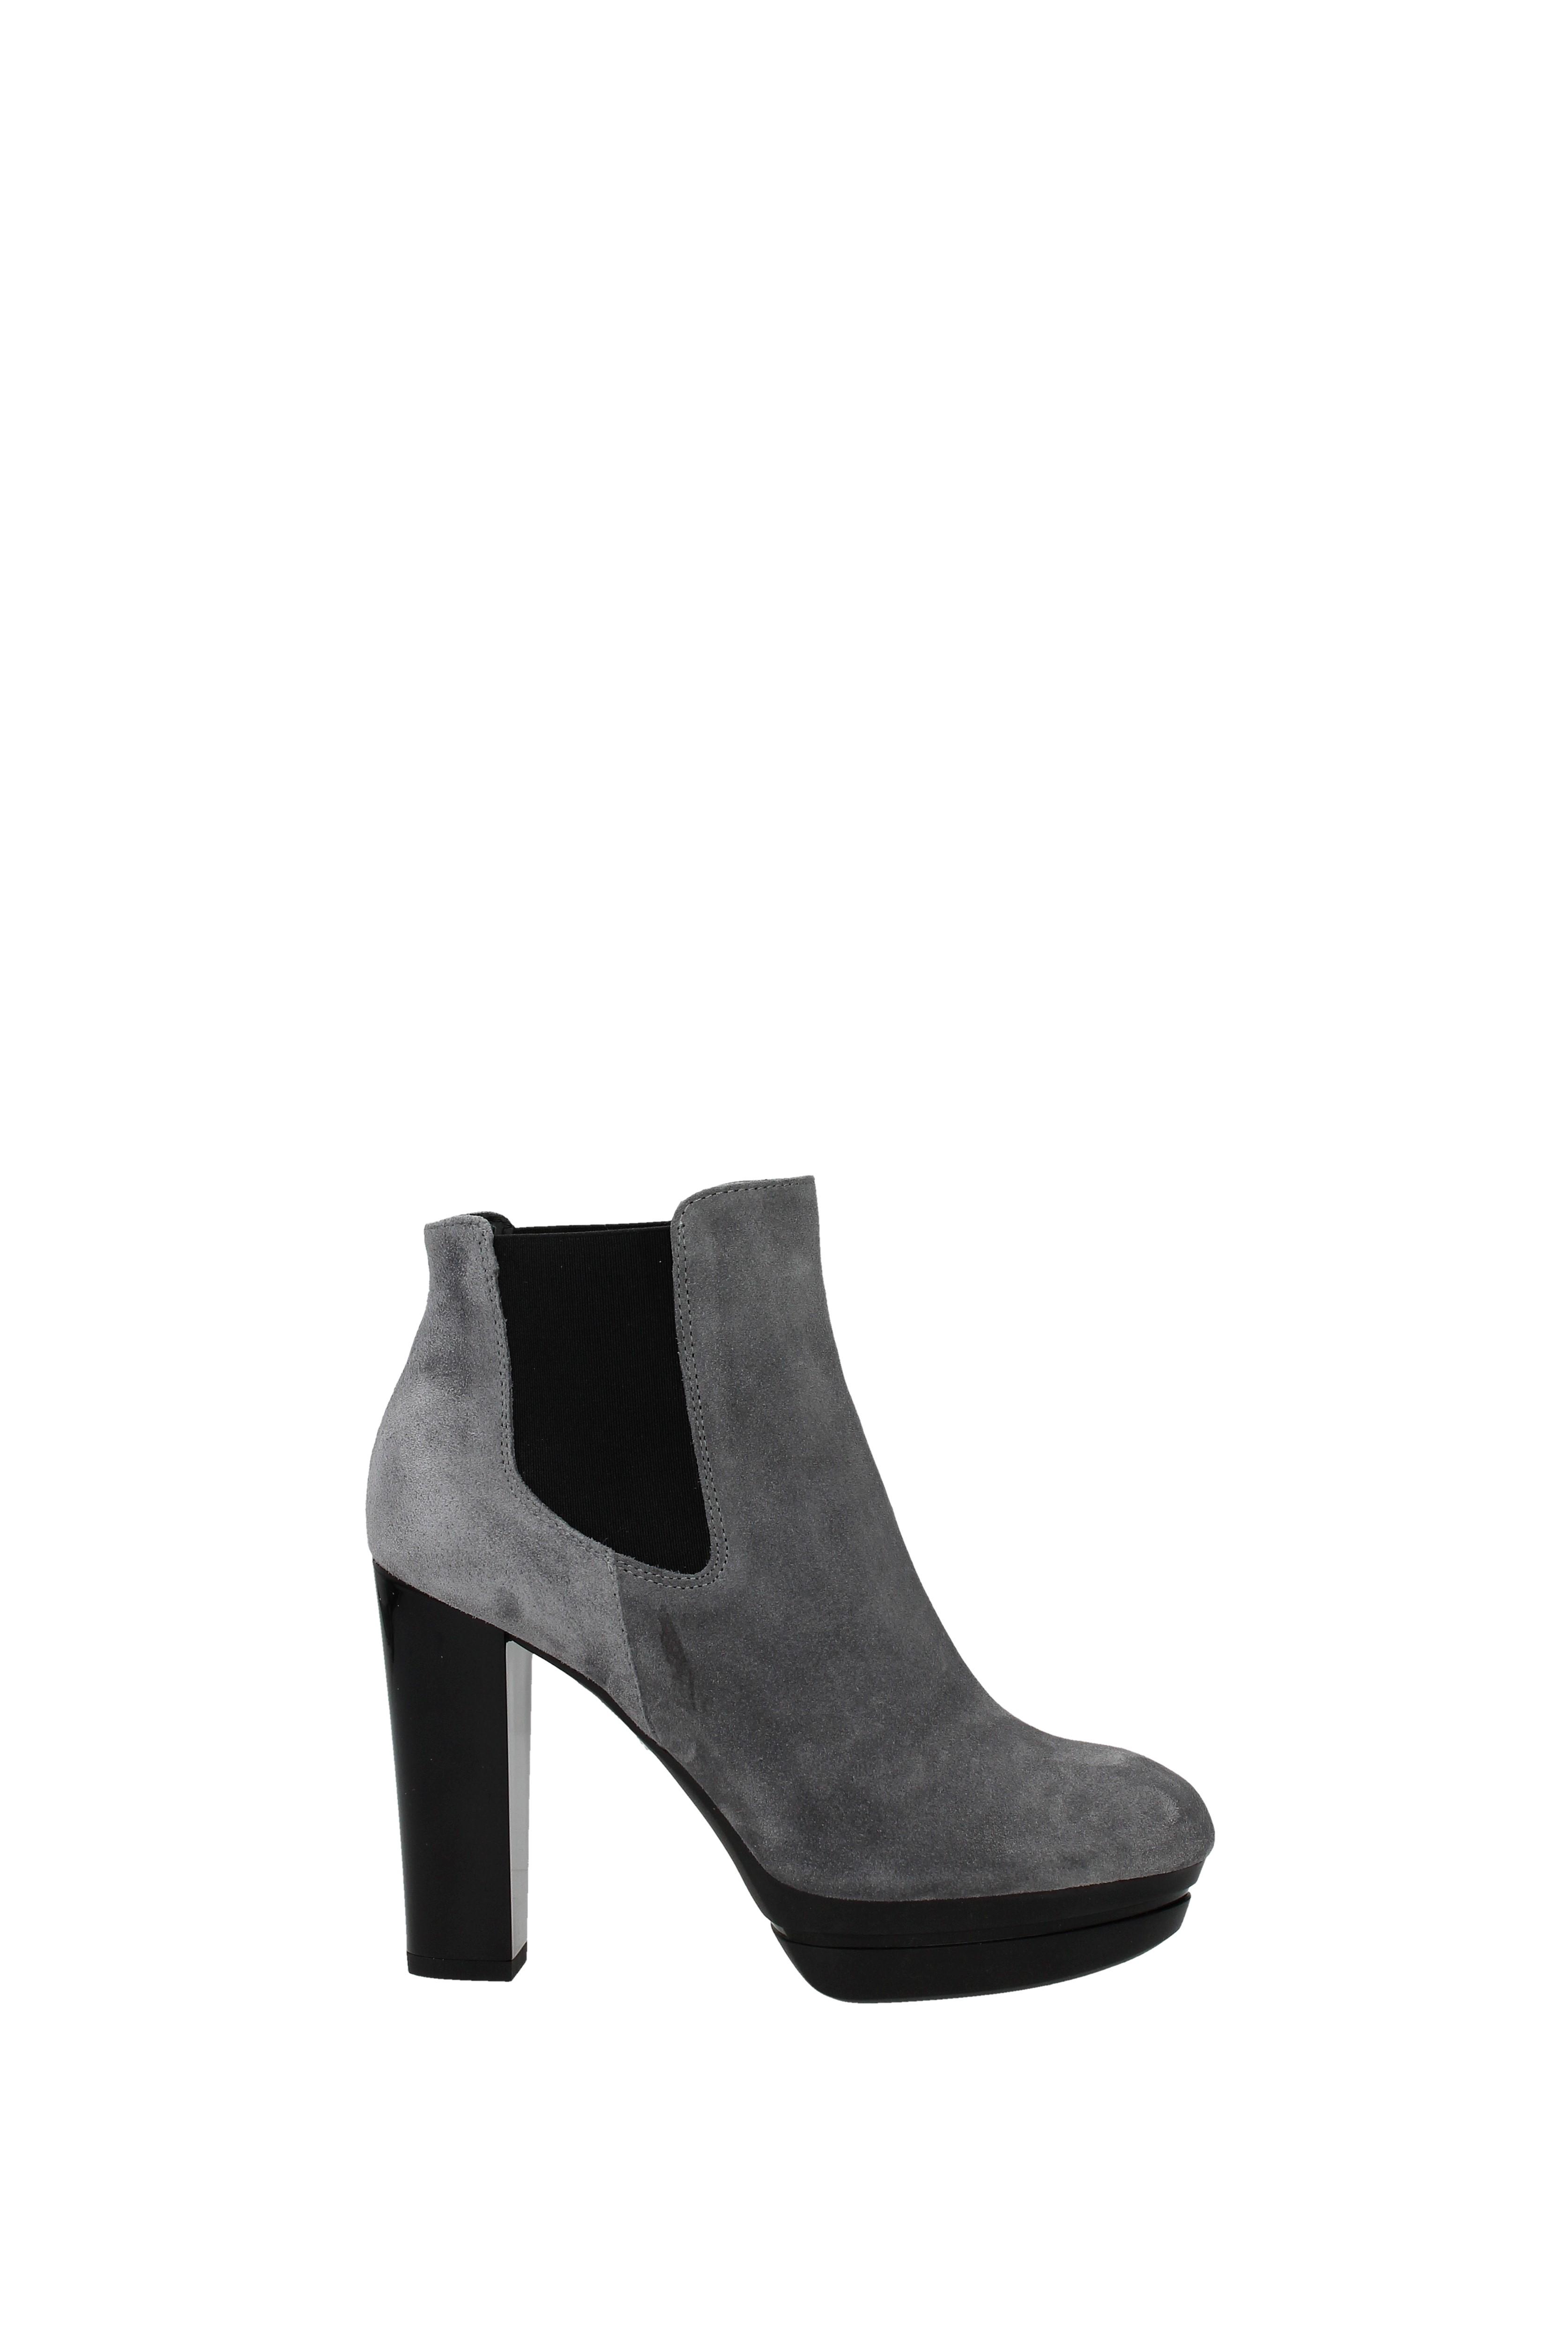 Nero Giardini p85063d avorio sneakers donna pelle stringata zeppa ... 114d5221ef4